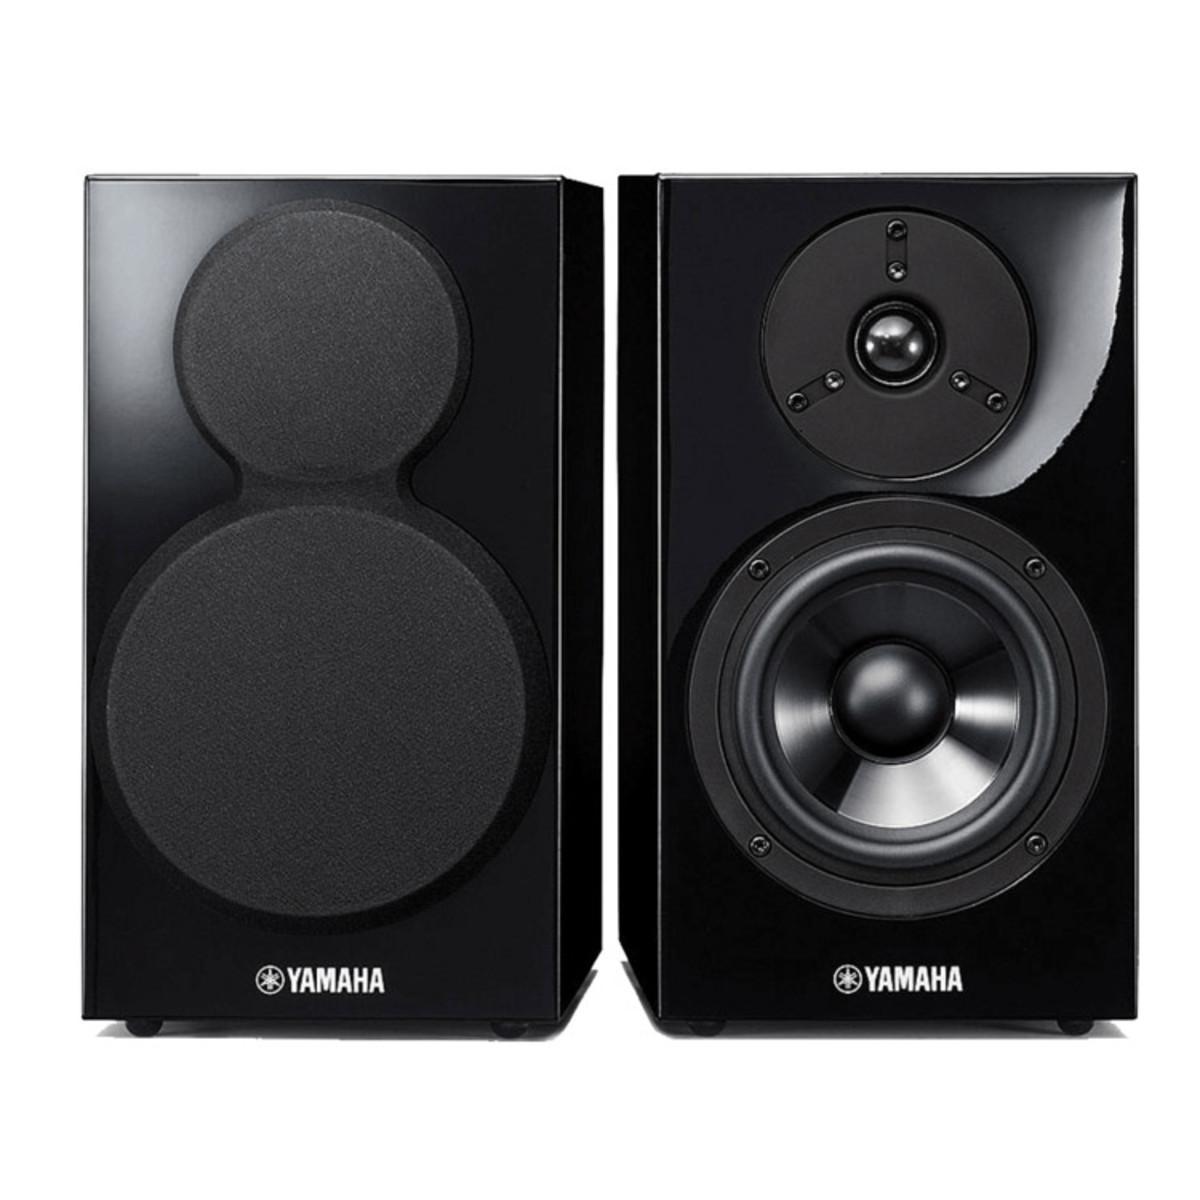 DISC Yamaha NS-BP300 Hi-Fi Speaker Pair, Piano Black bei Gear4music